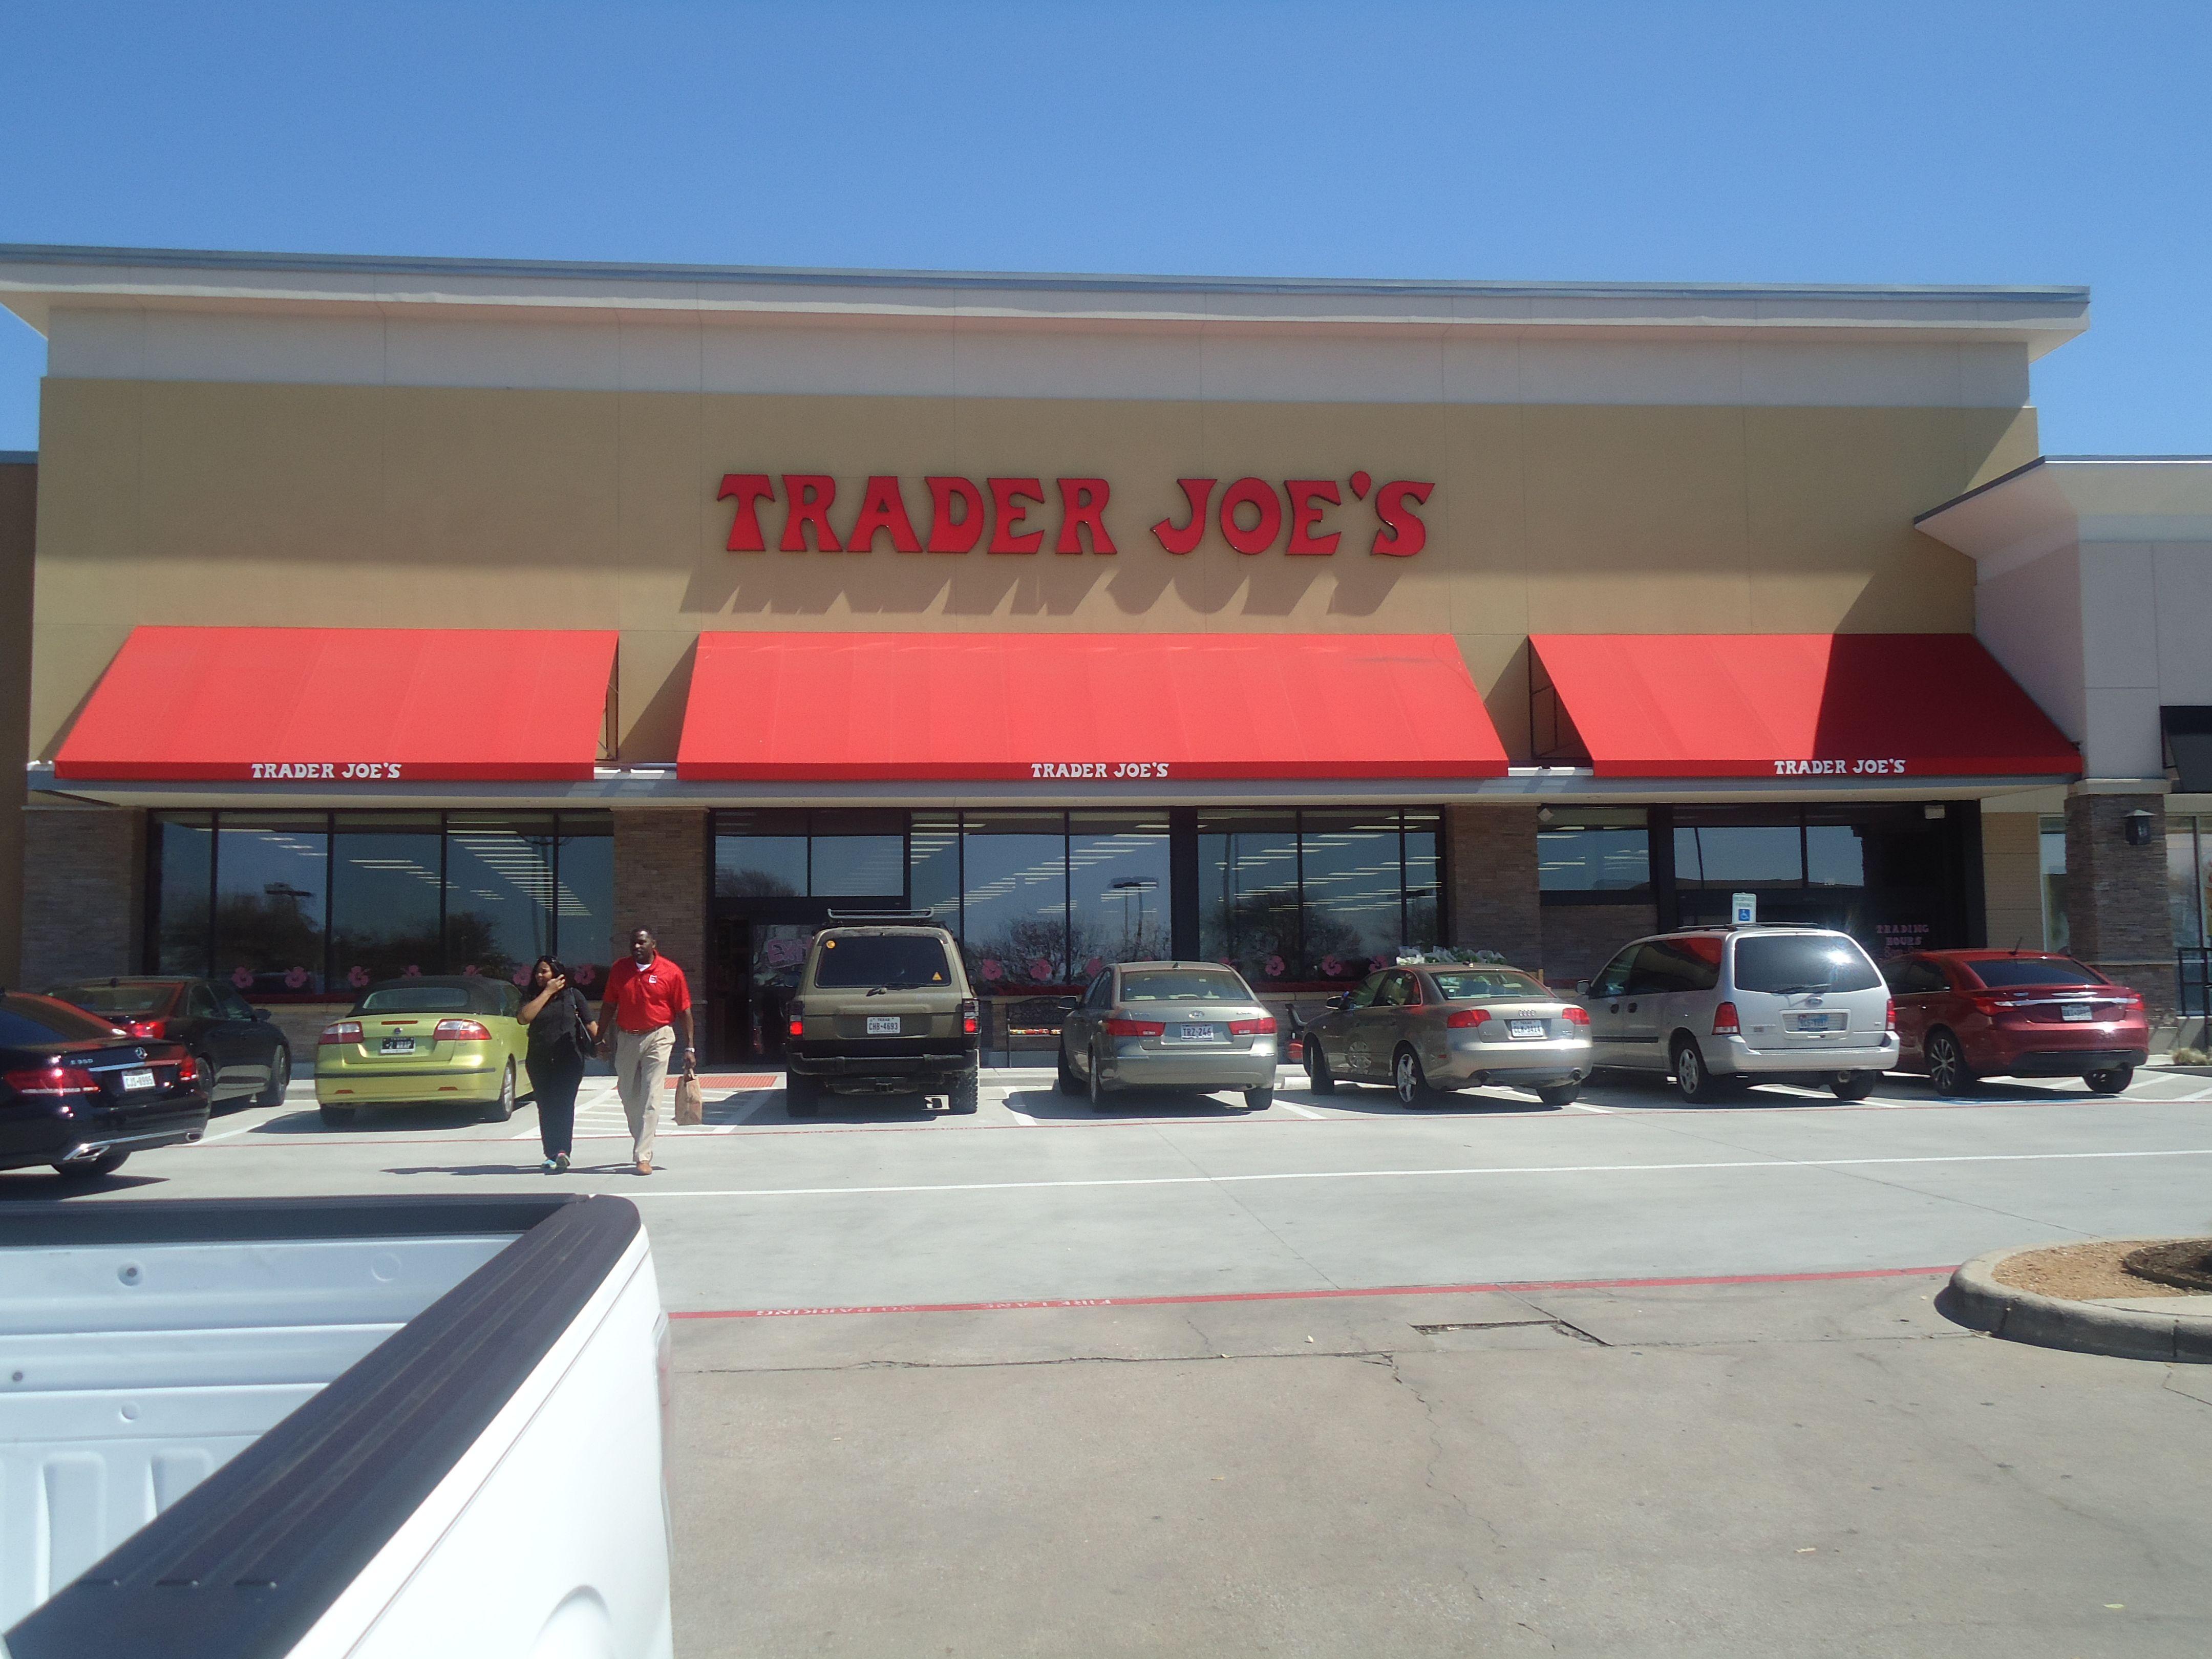 Trader Joe's is located at 2400 Preston Rd. Plano, Texas